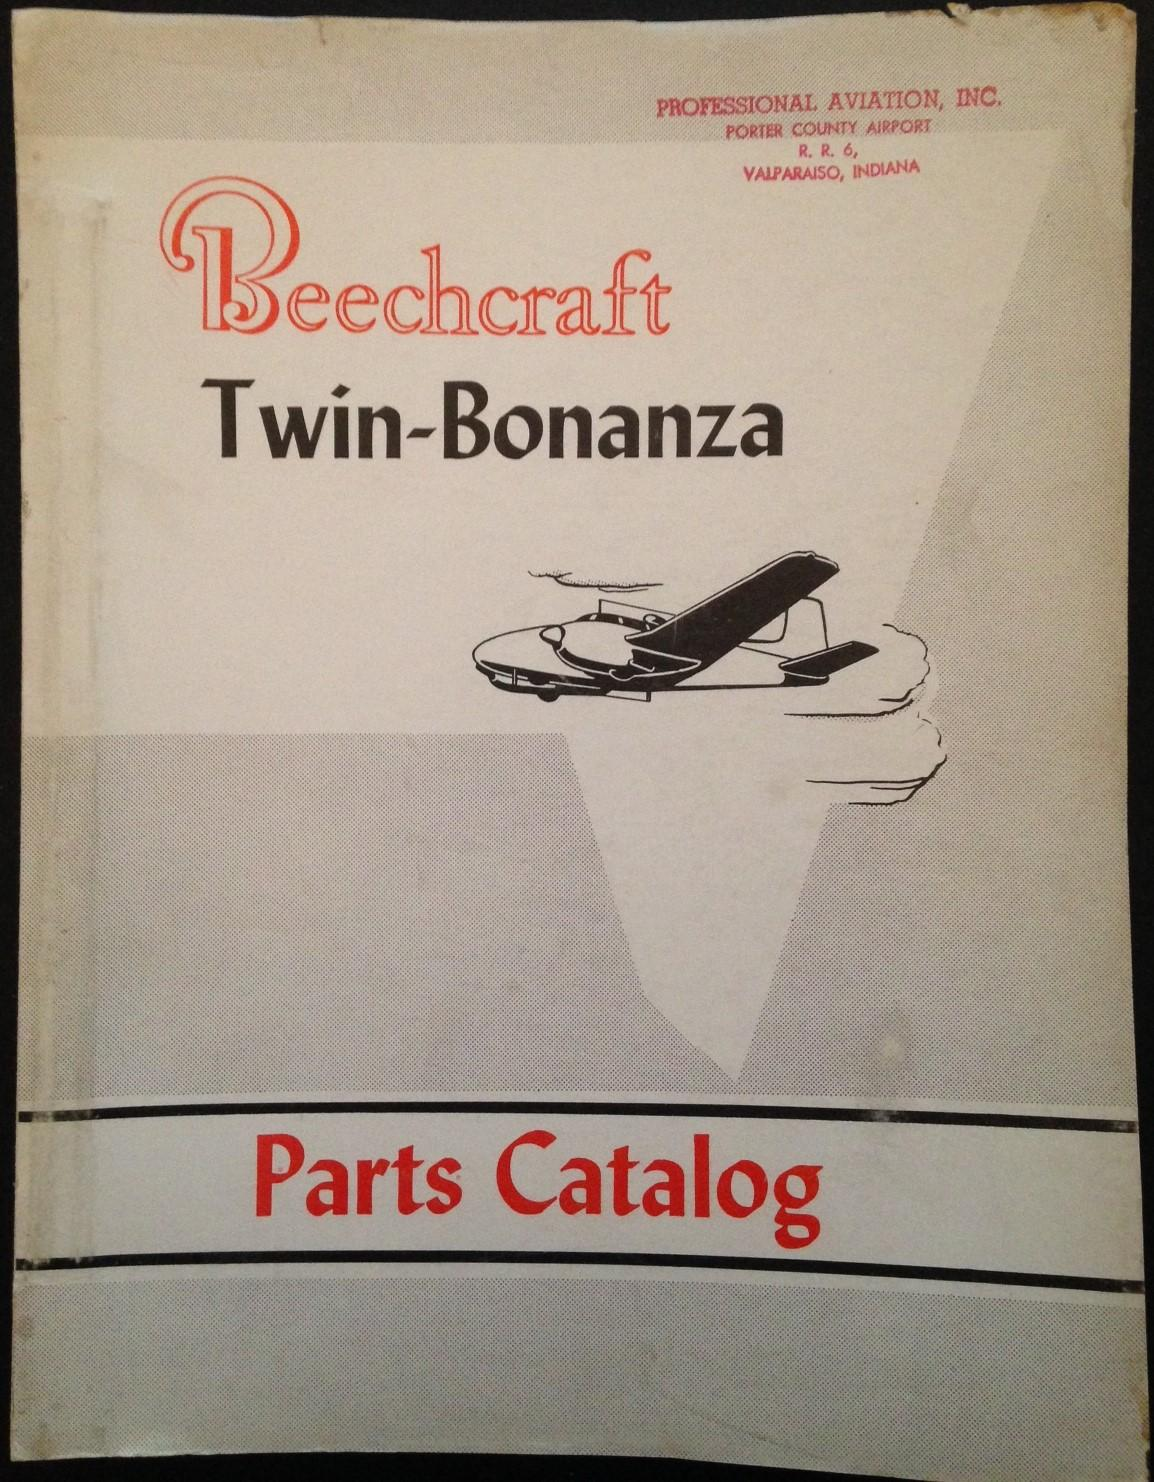 Beechcraft Twin-Bonanza Model 50 Parts